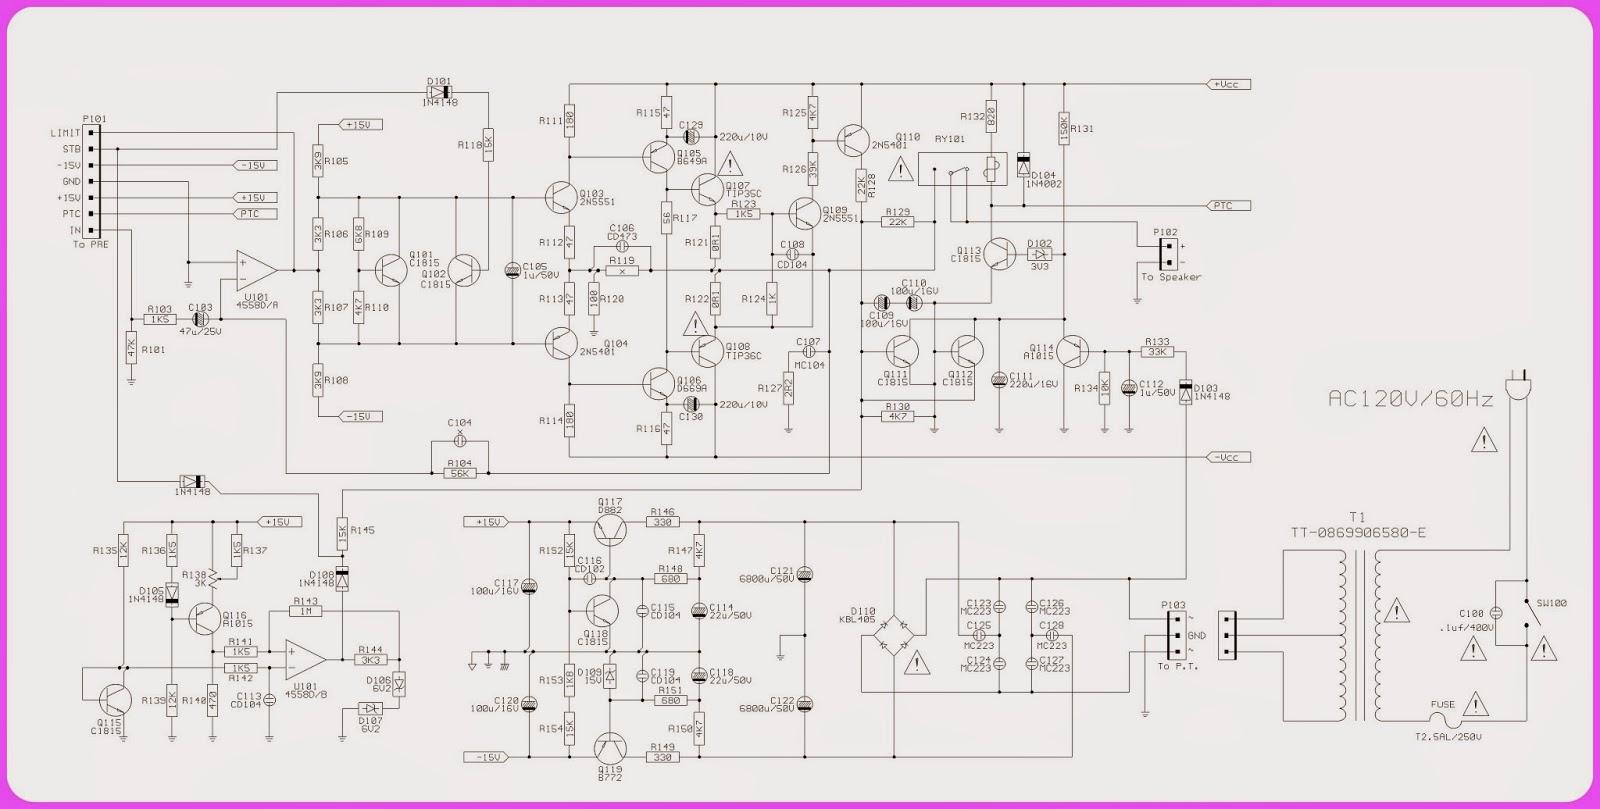 jbl subwoofer amplifier circuit diagram